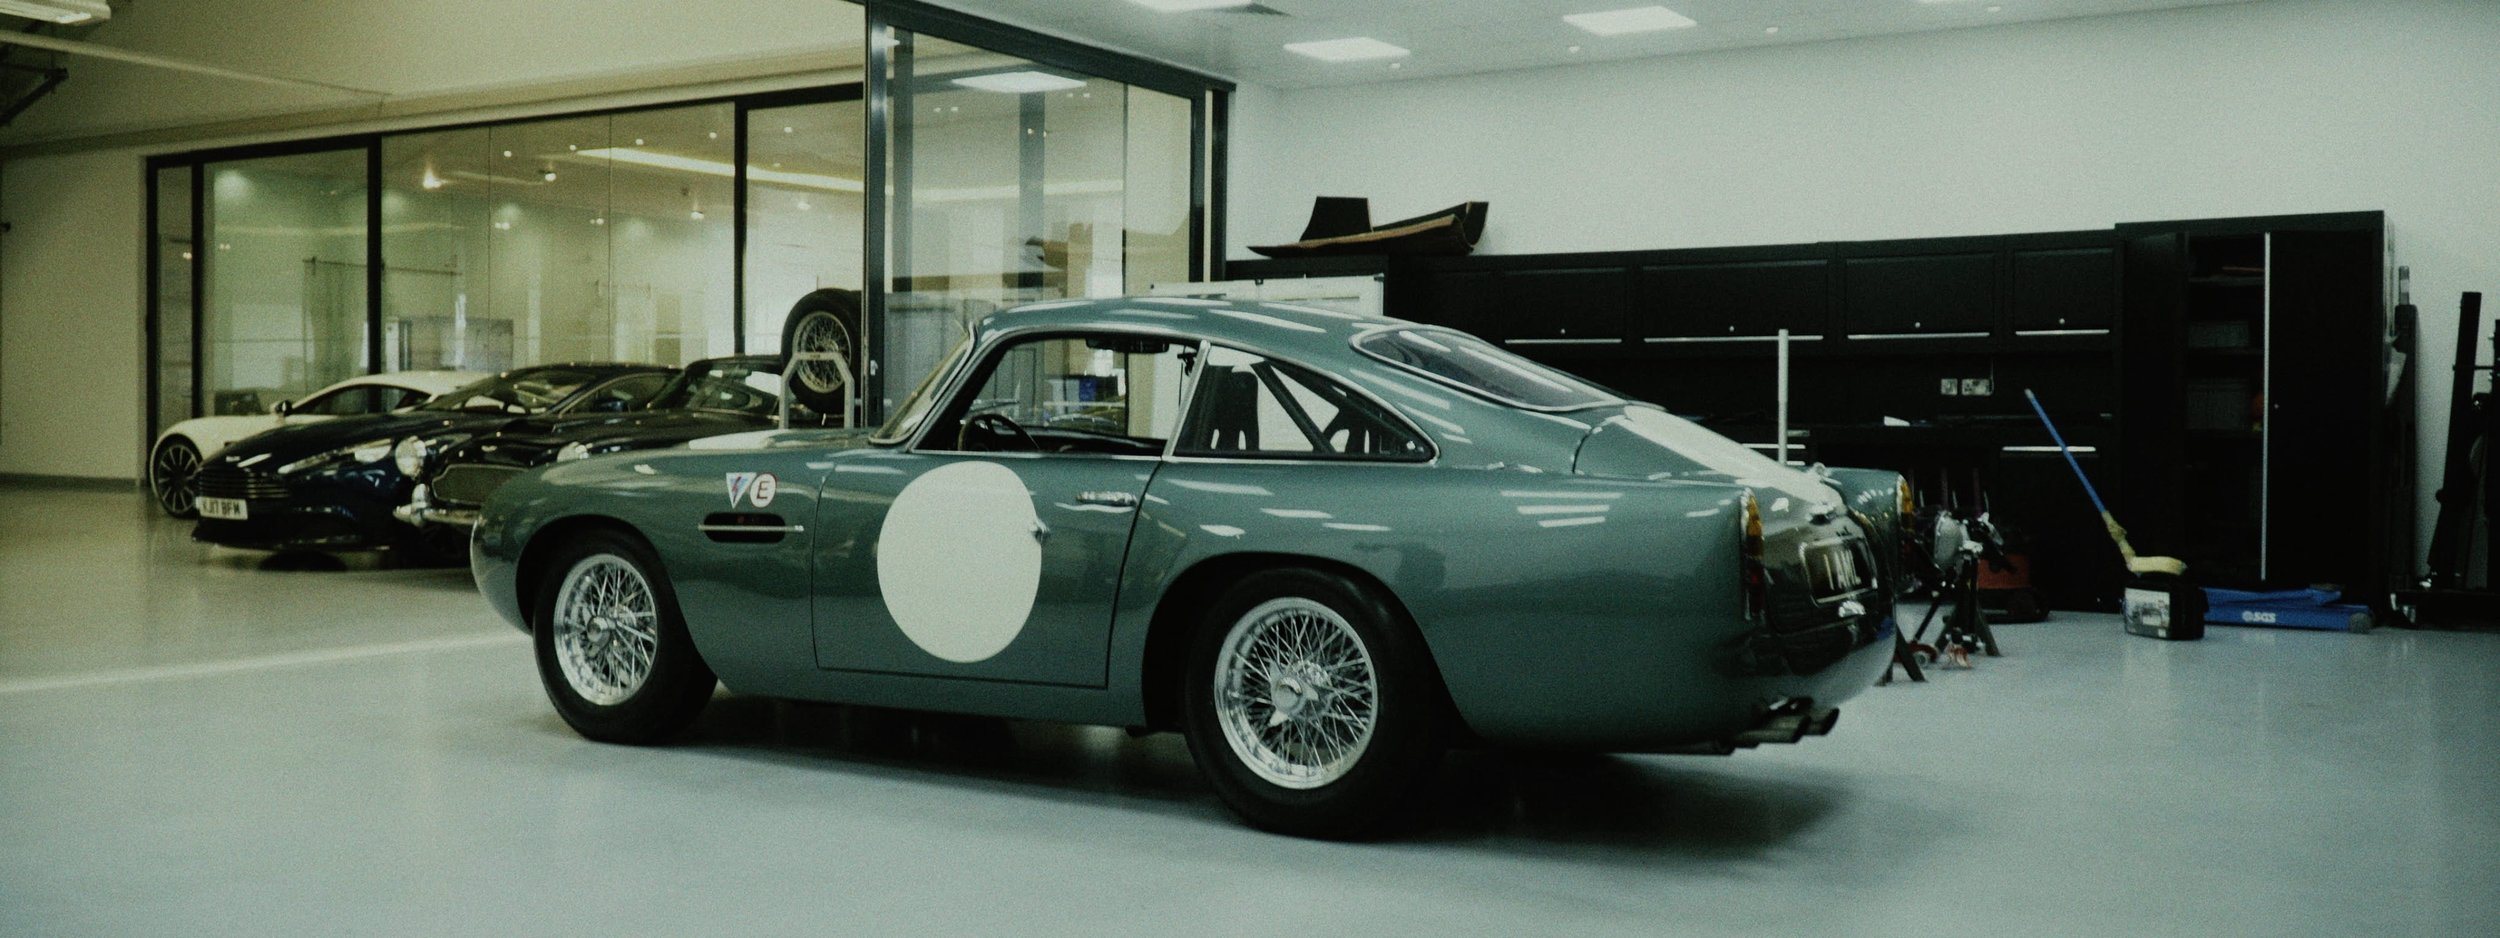 Aston DB4 frame 17.jpg